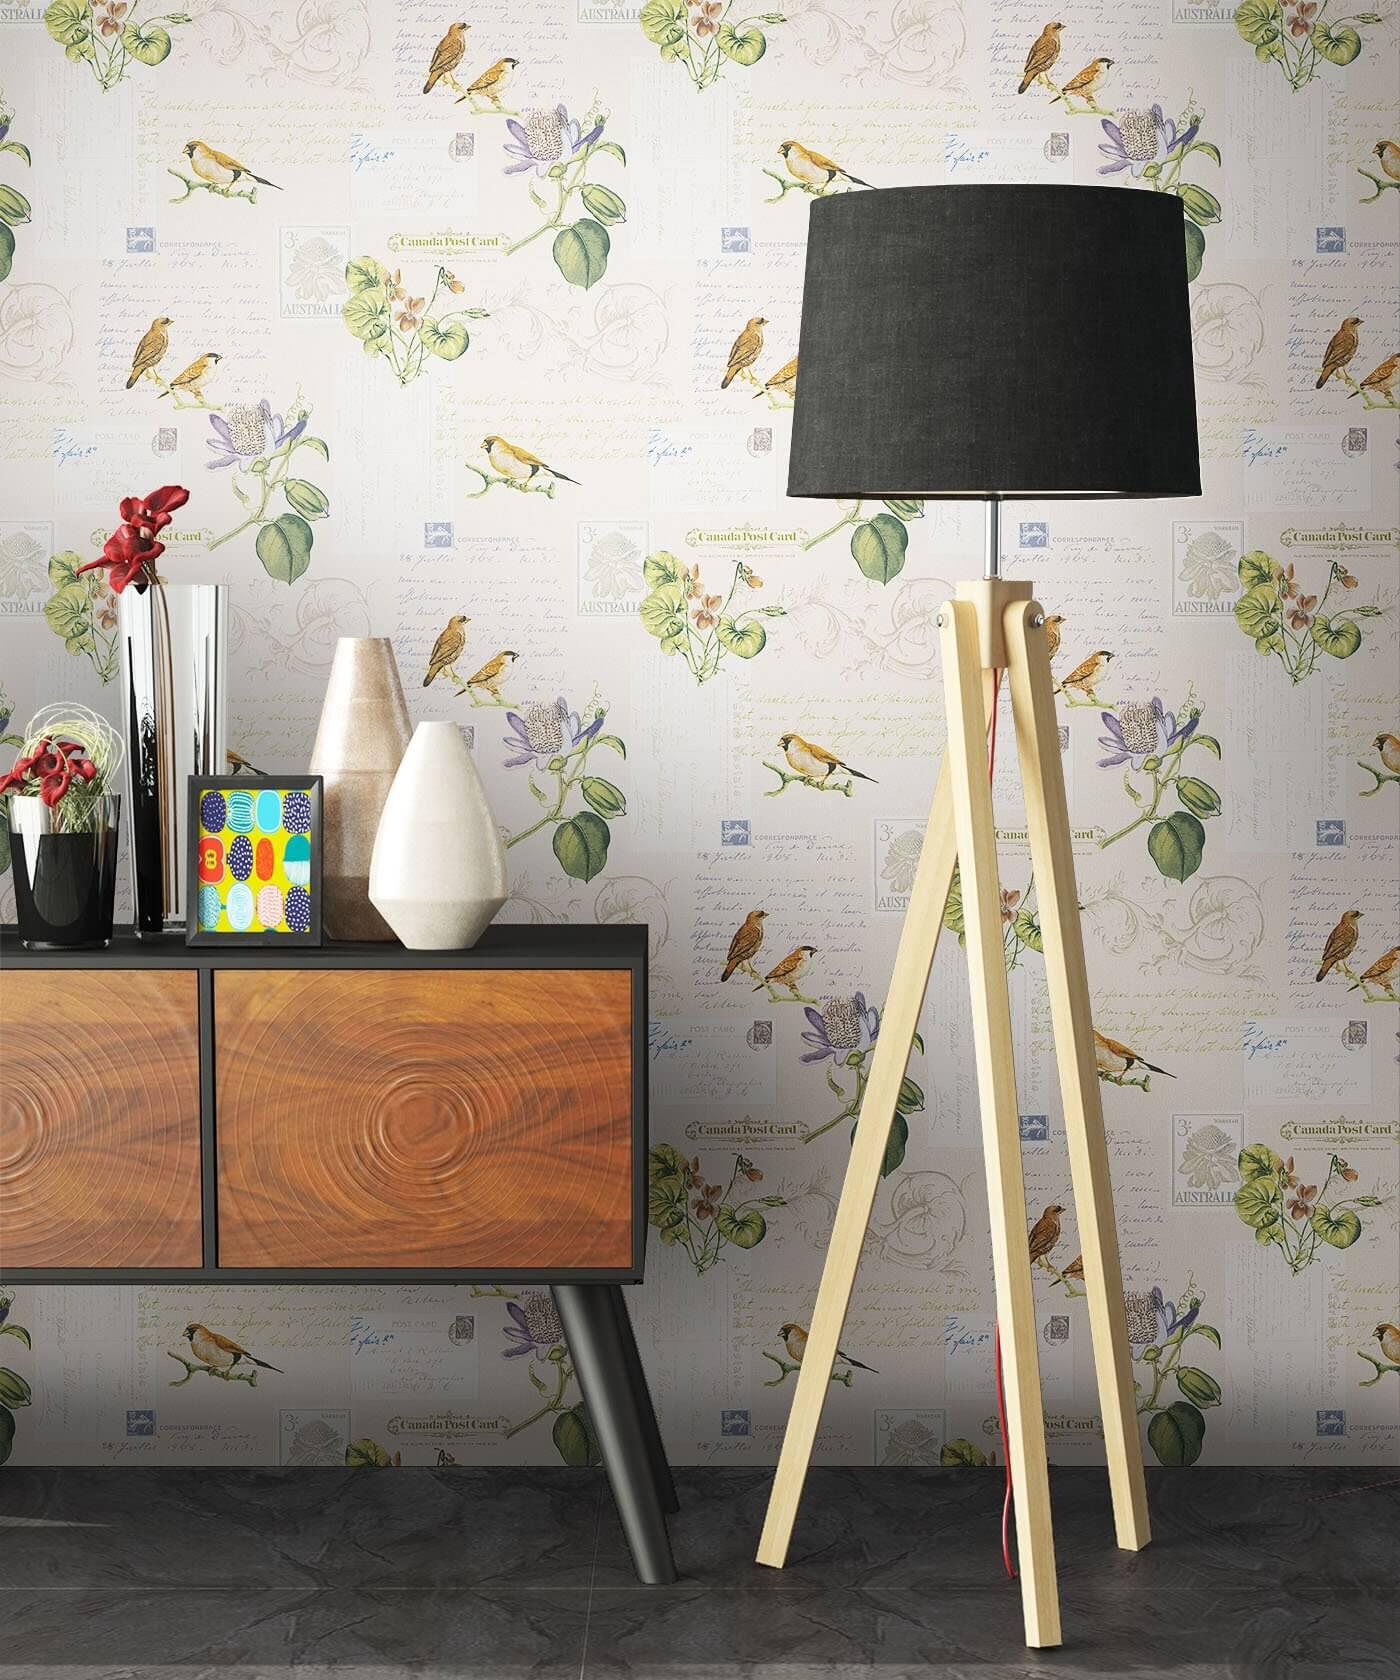 avessio cor. Black Bedroom Furniture Sets. Home Design Ideas